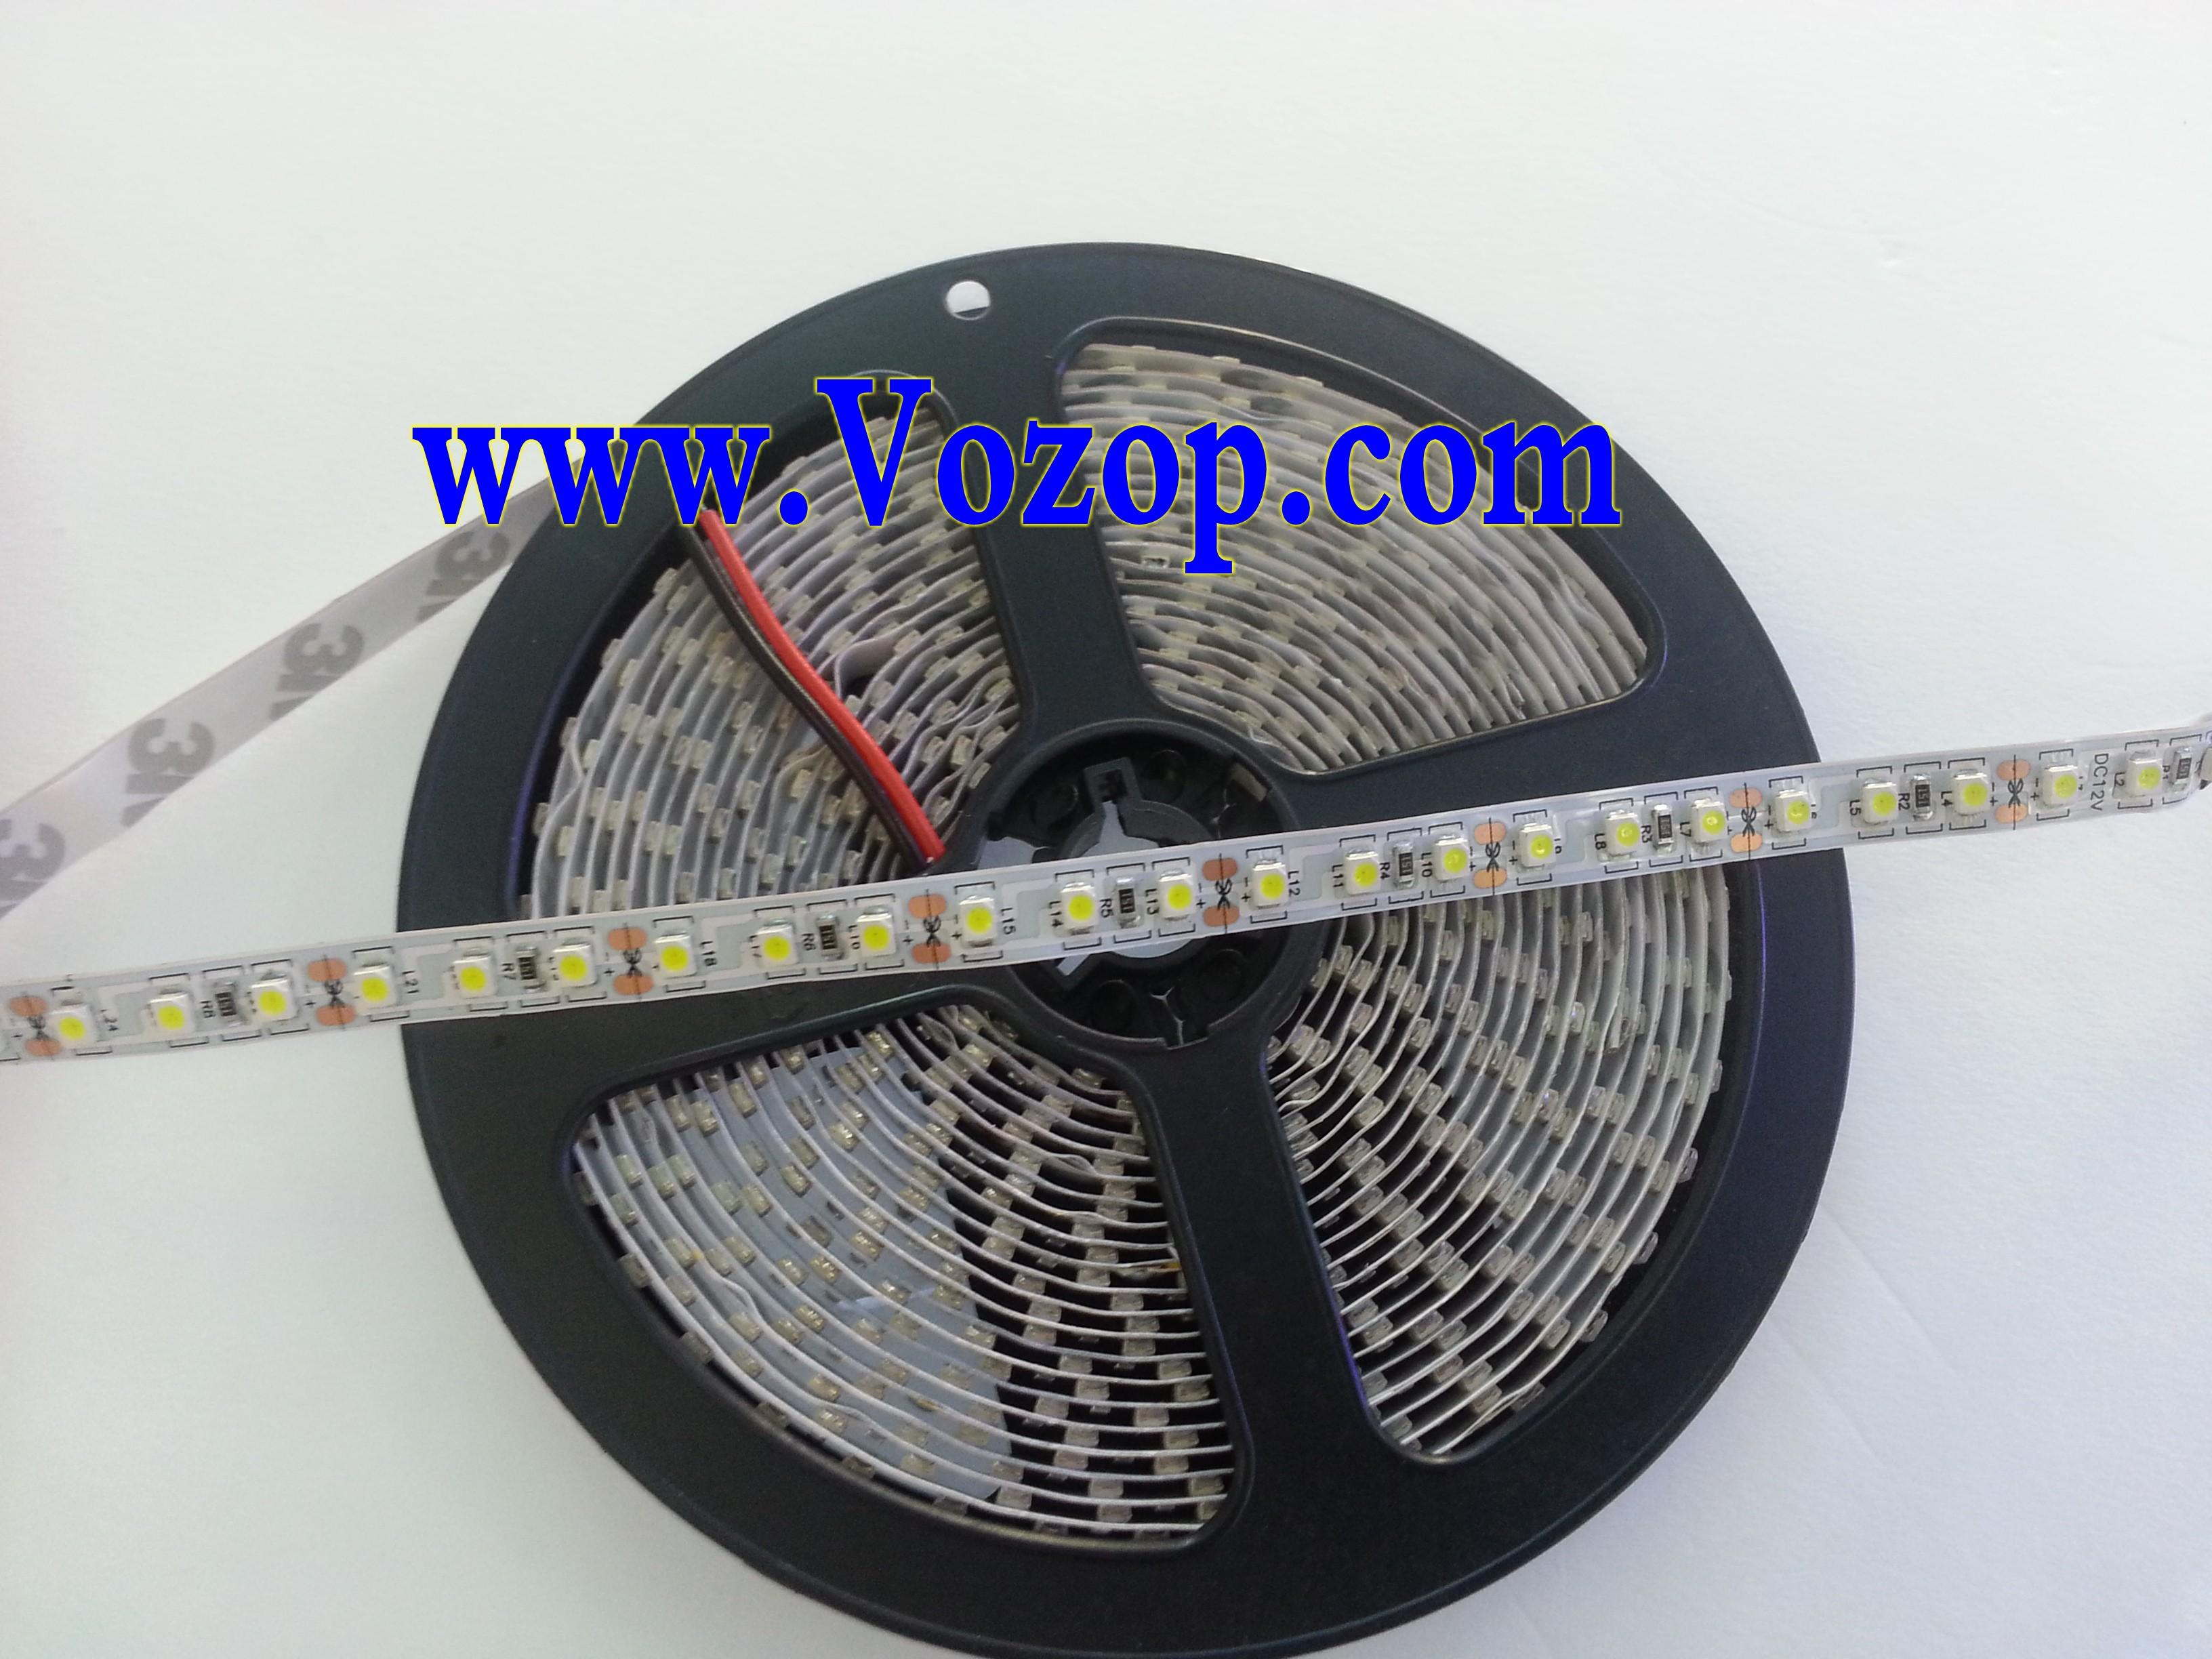 3528_LED_Strip_light_5M_600_LEDs_Non_Waterproof_Lights